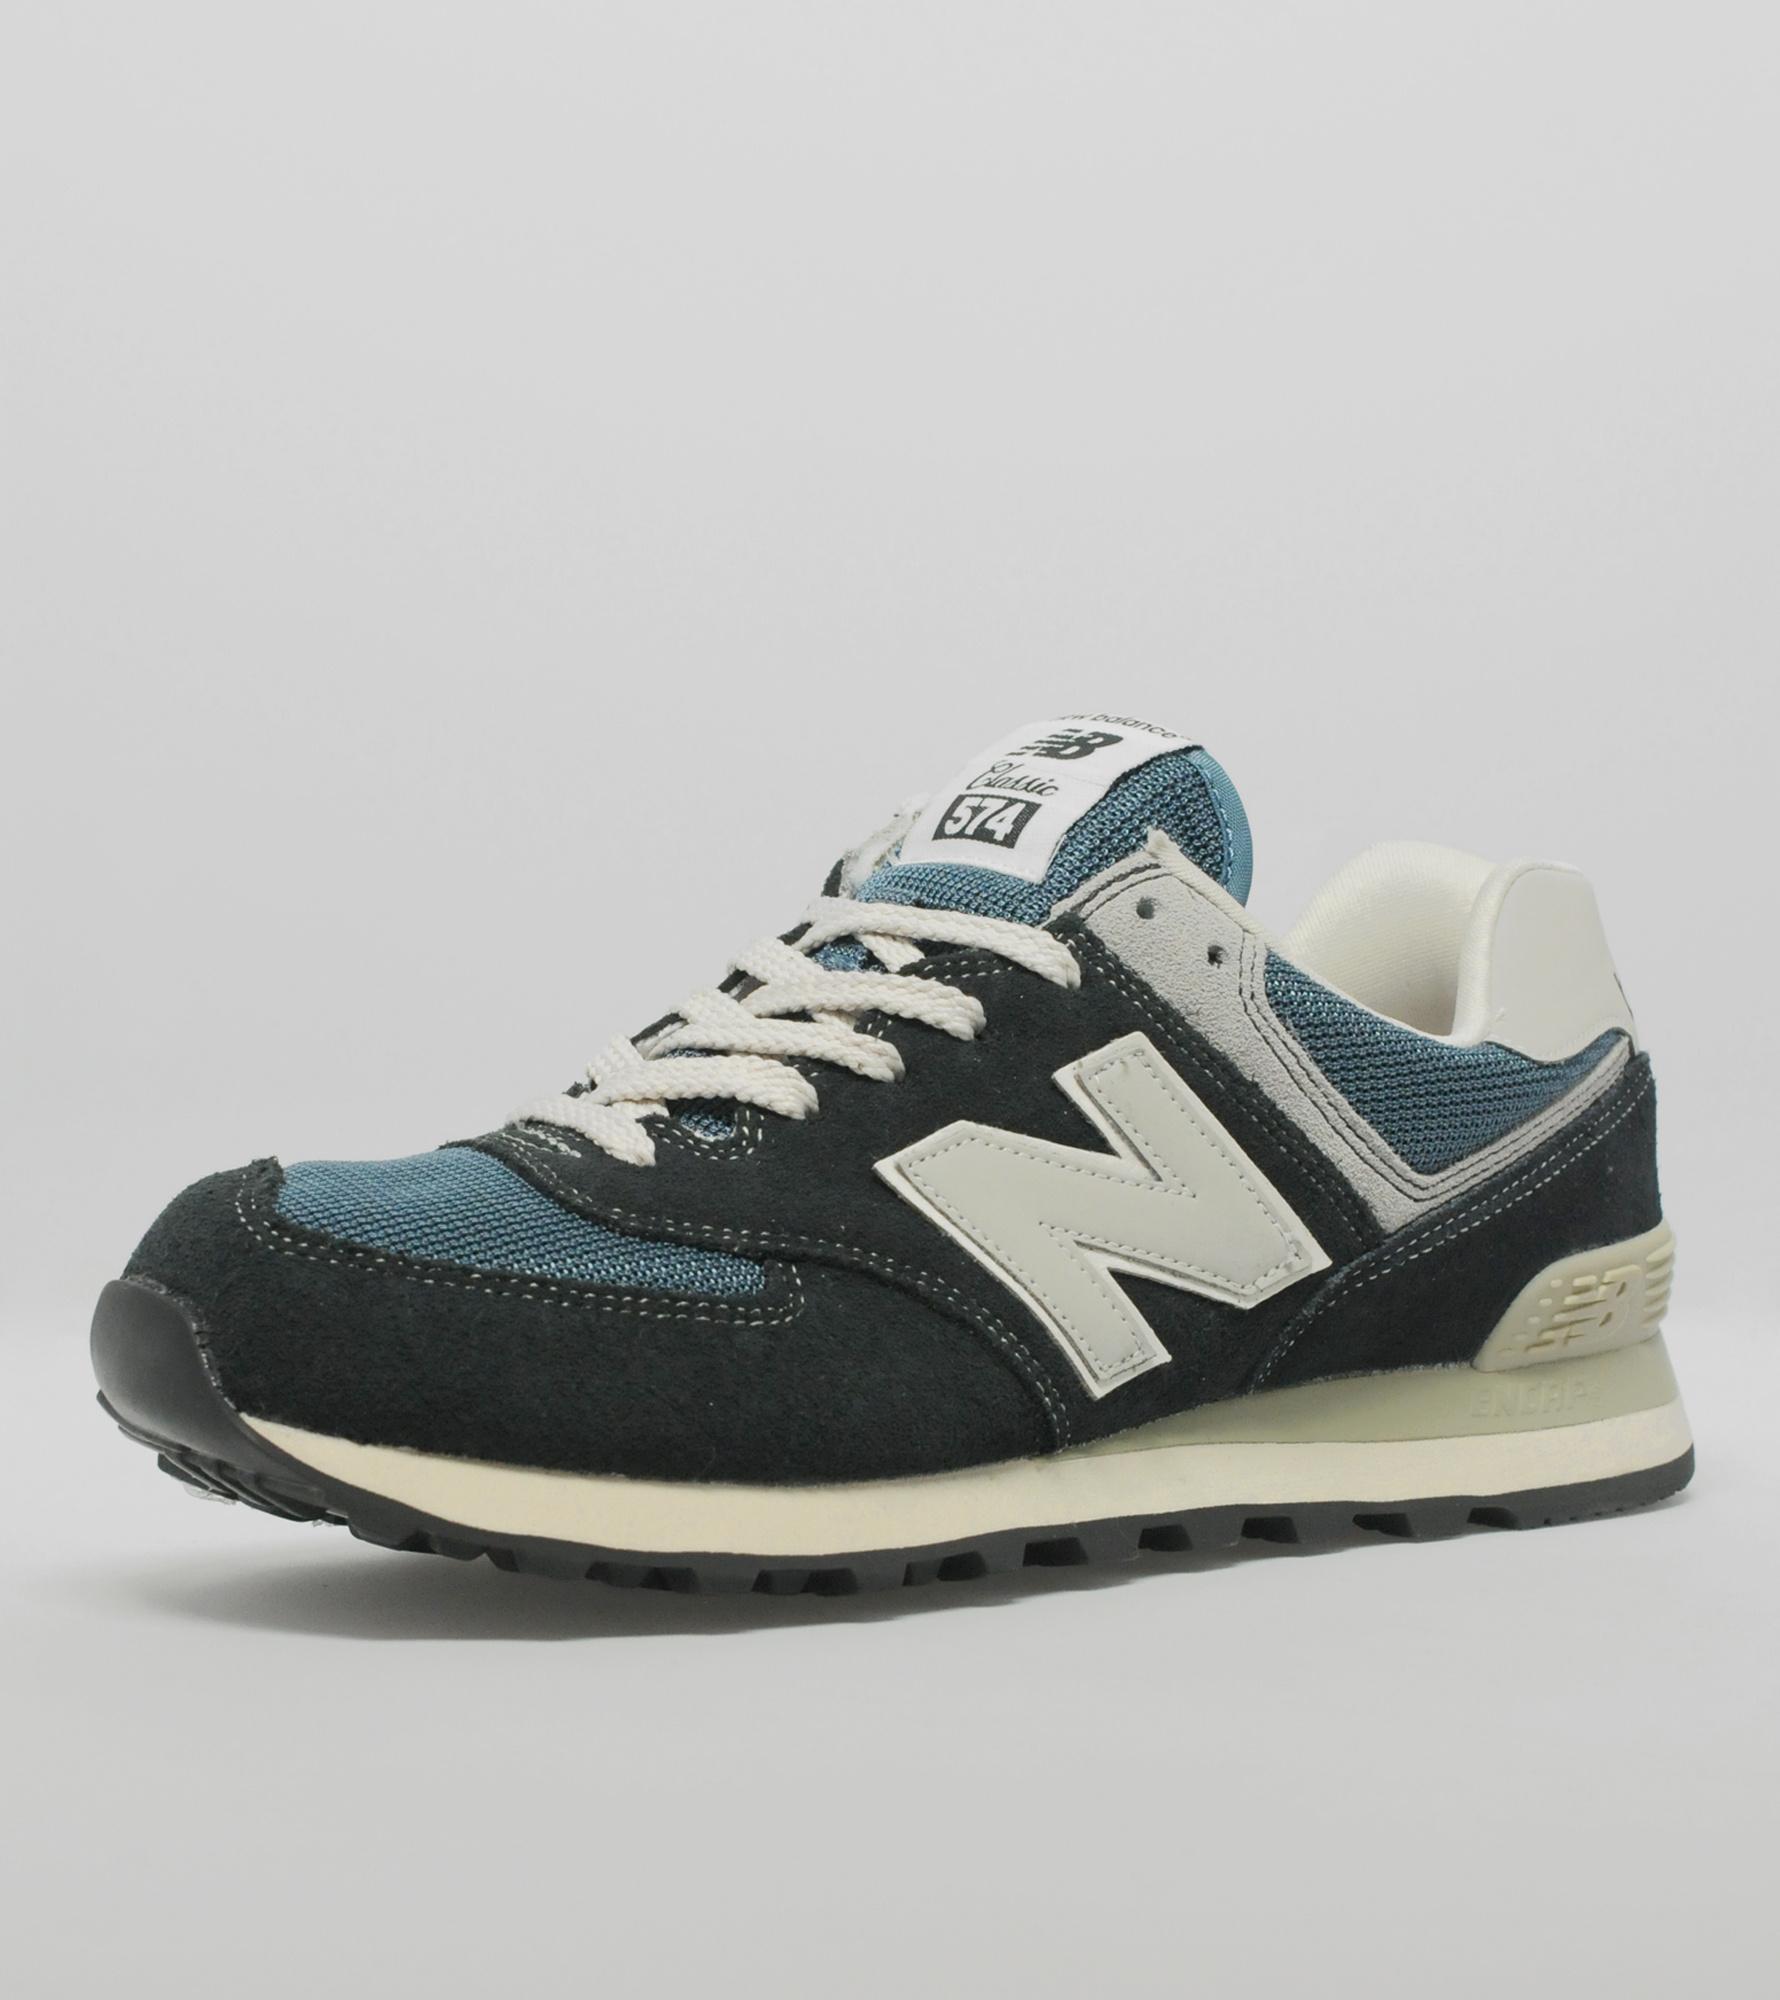 new balance 574 size 4.5